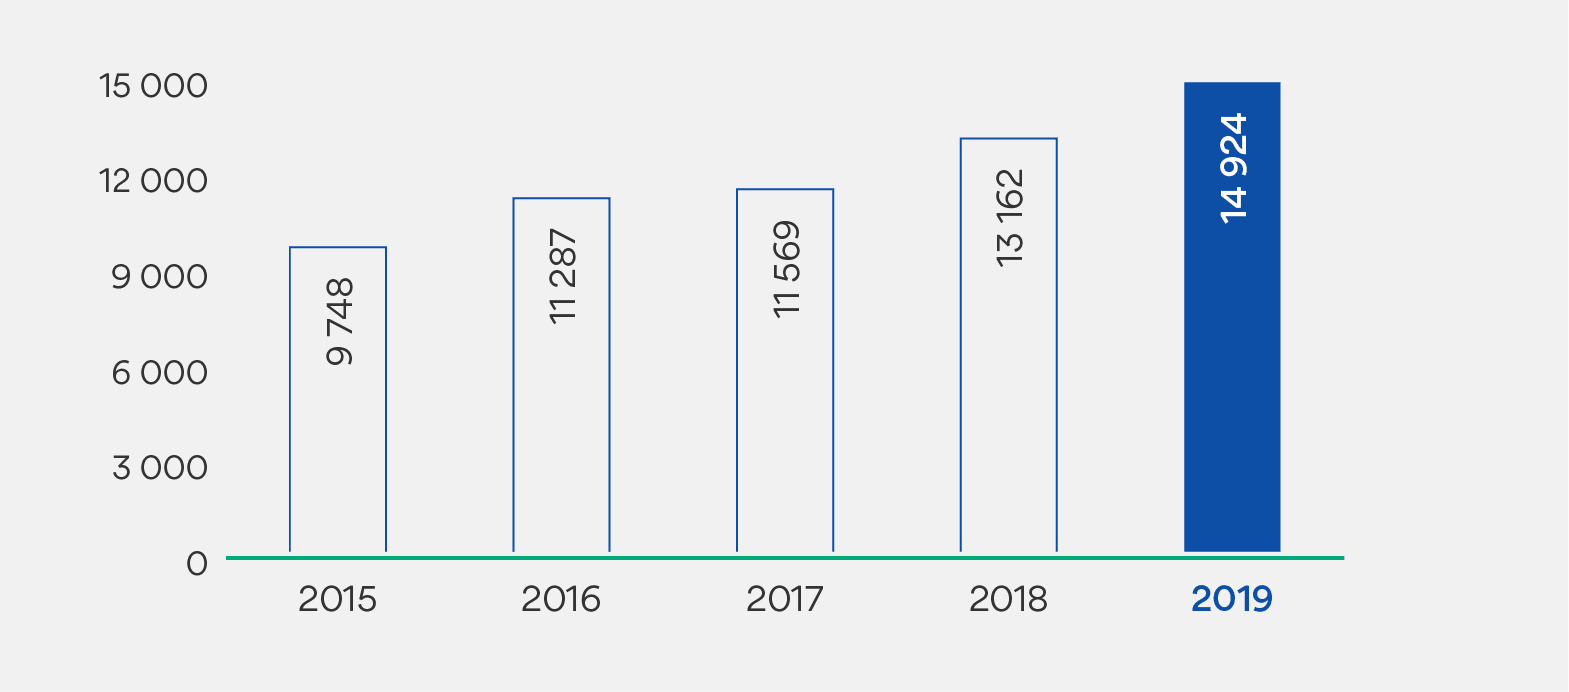 Tabell som viser driftsinntekter i millioner kroner. 2015: 9748. 2016: 11 287. 2017: 11569. 2018: 13 162. 2019: 14 924.